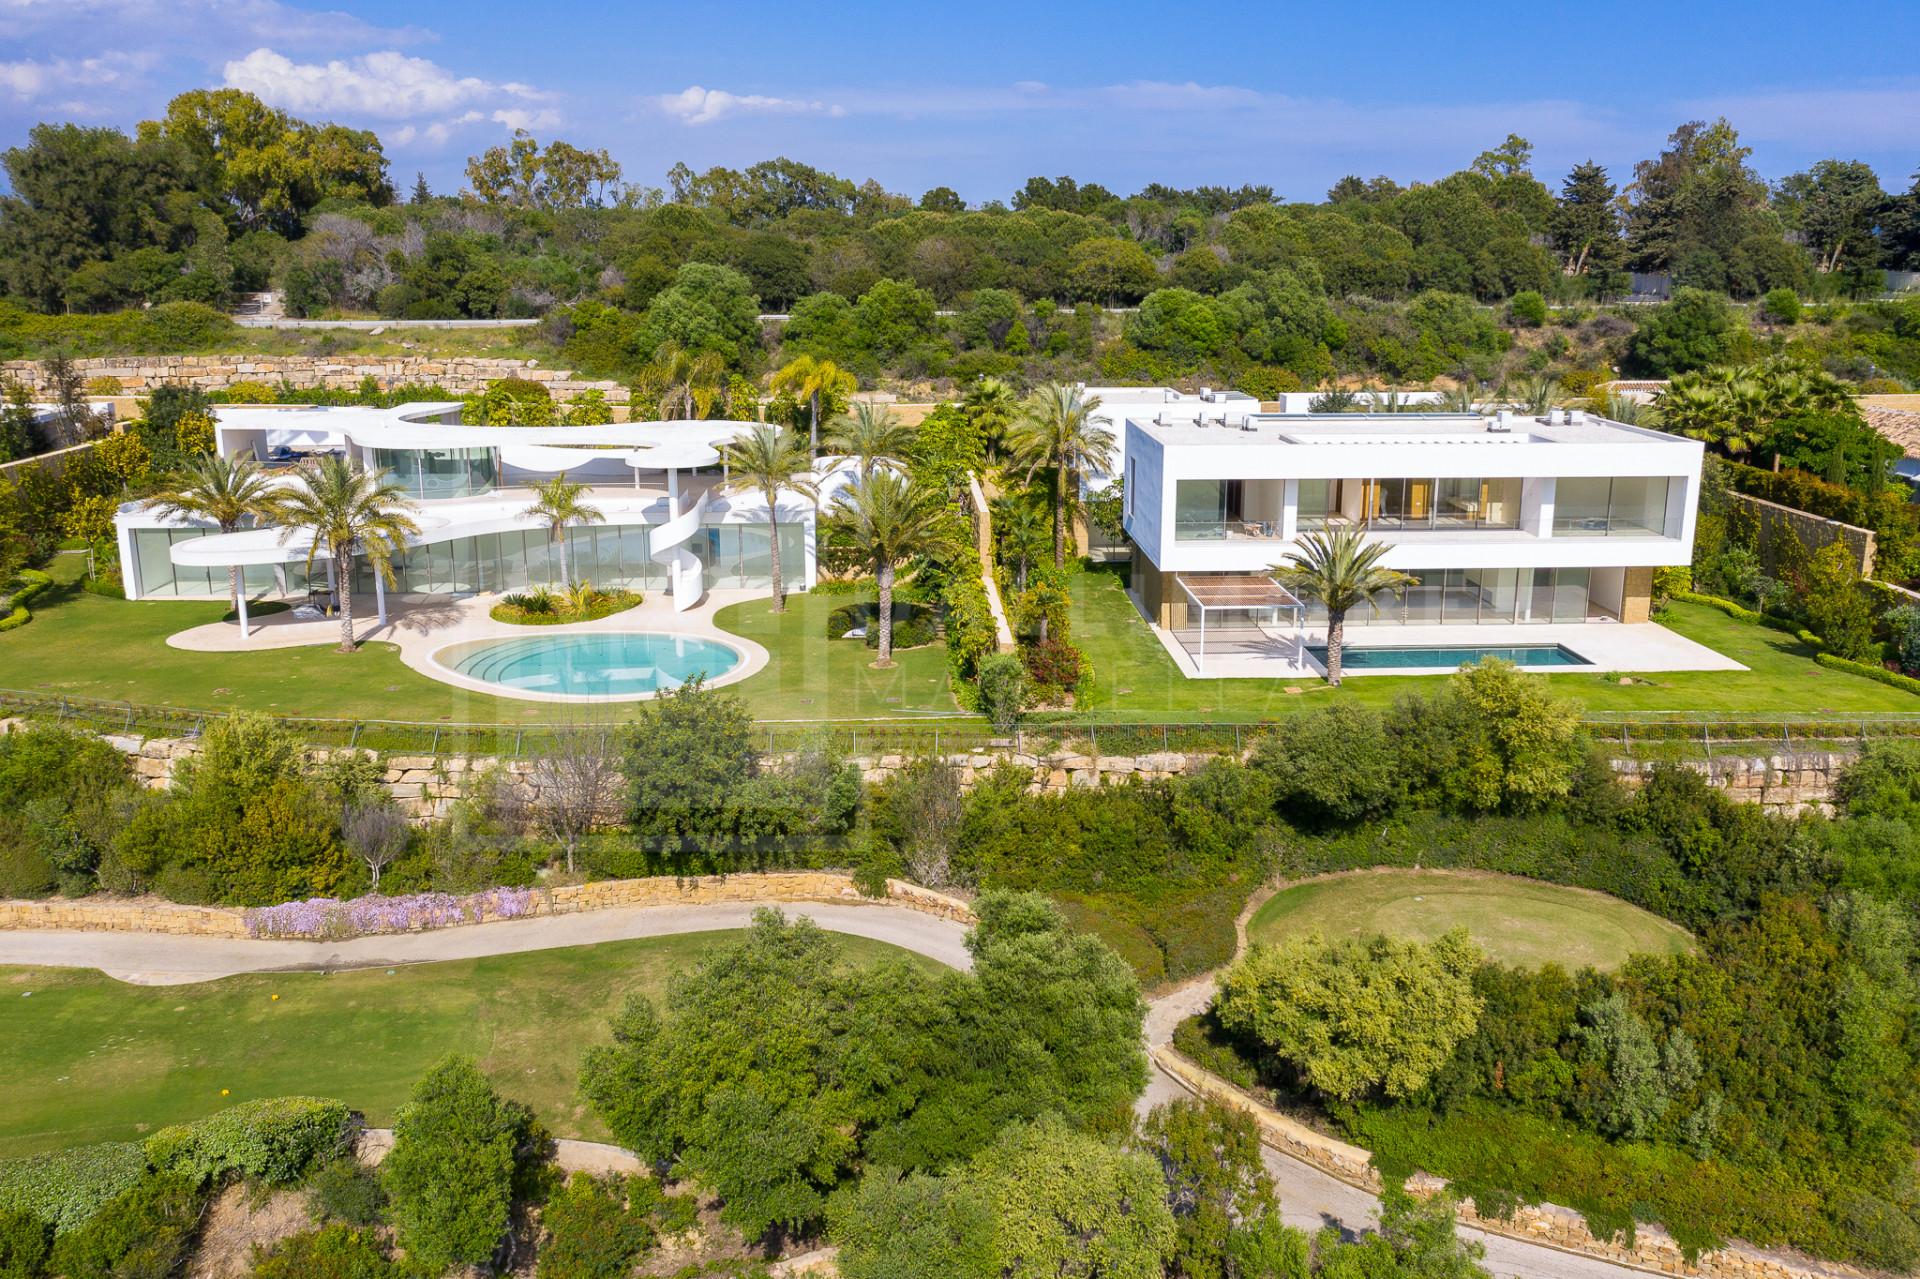 Villa Finca Cortesin, Casares - NEWV6800